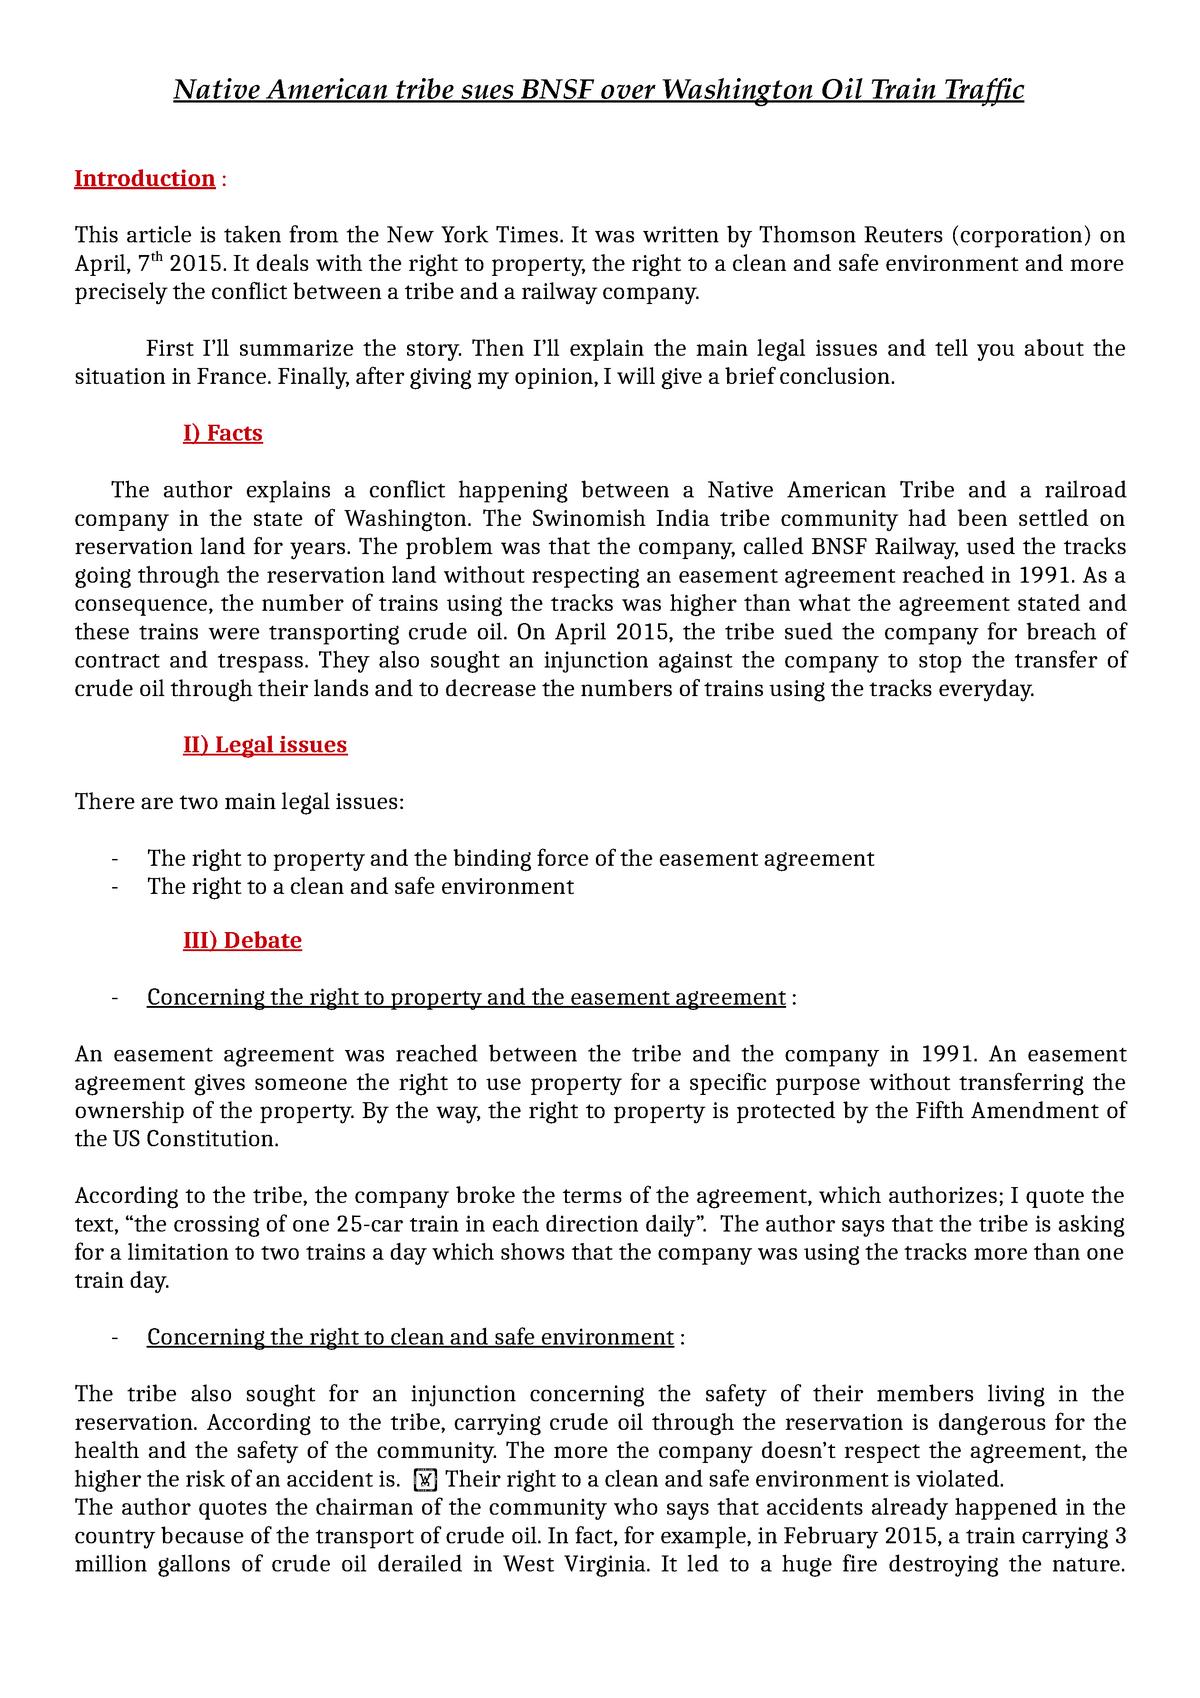 Business Law - Texte 3 - Business Law - StuDocu